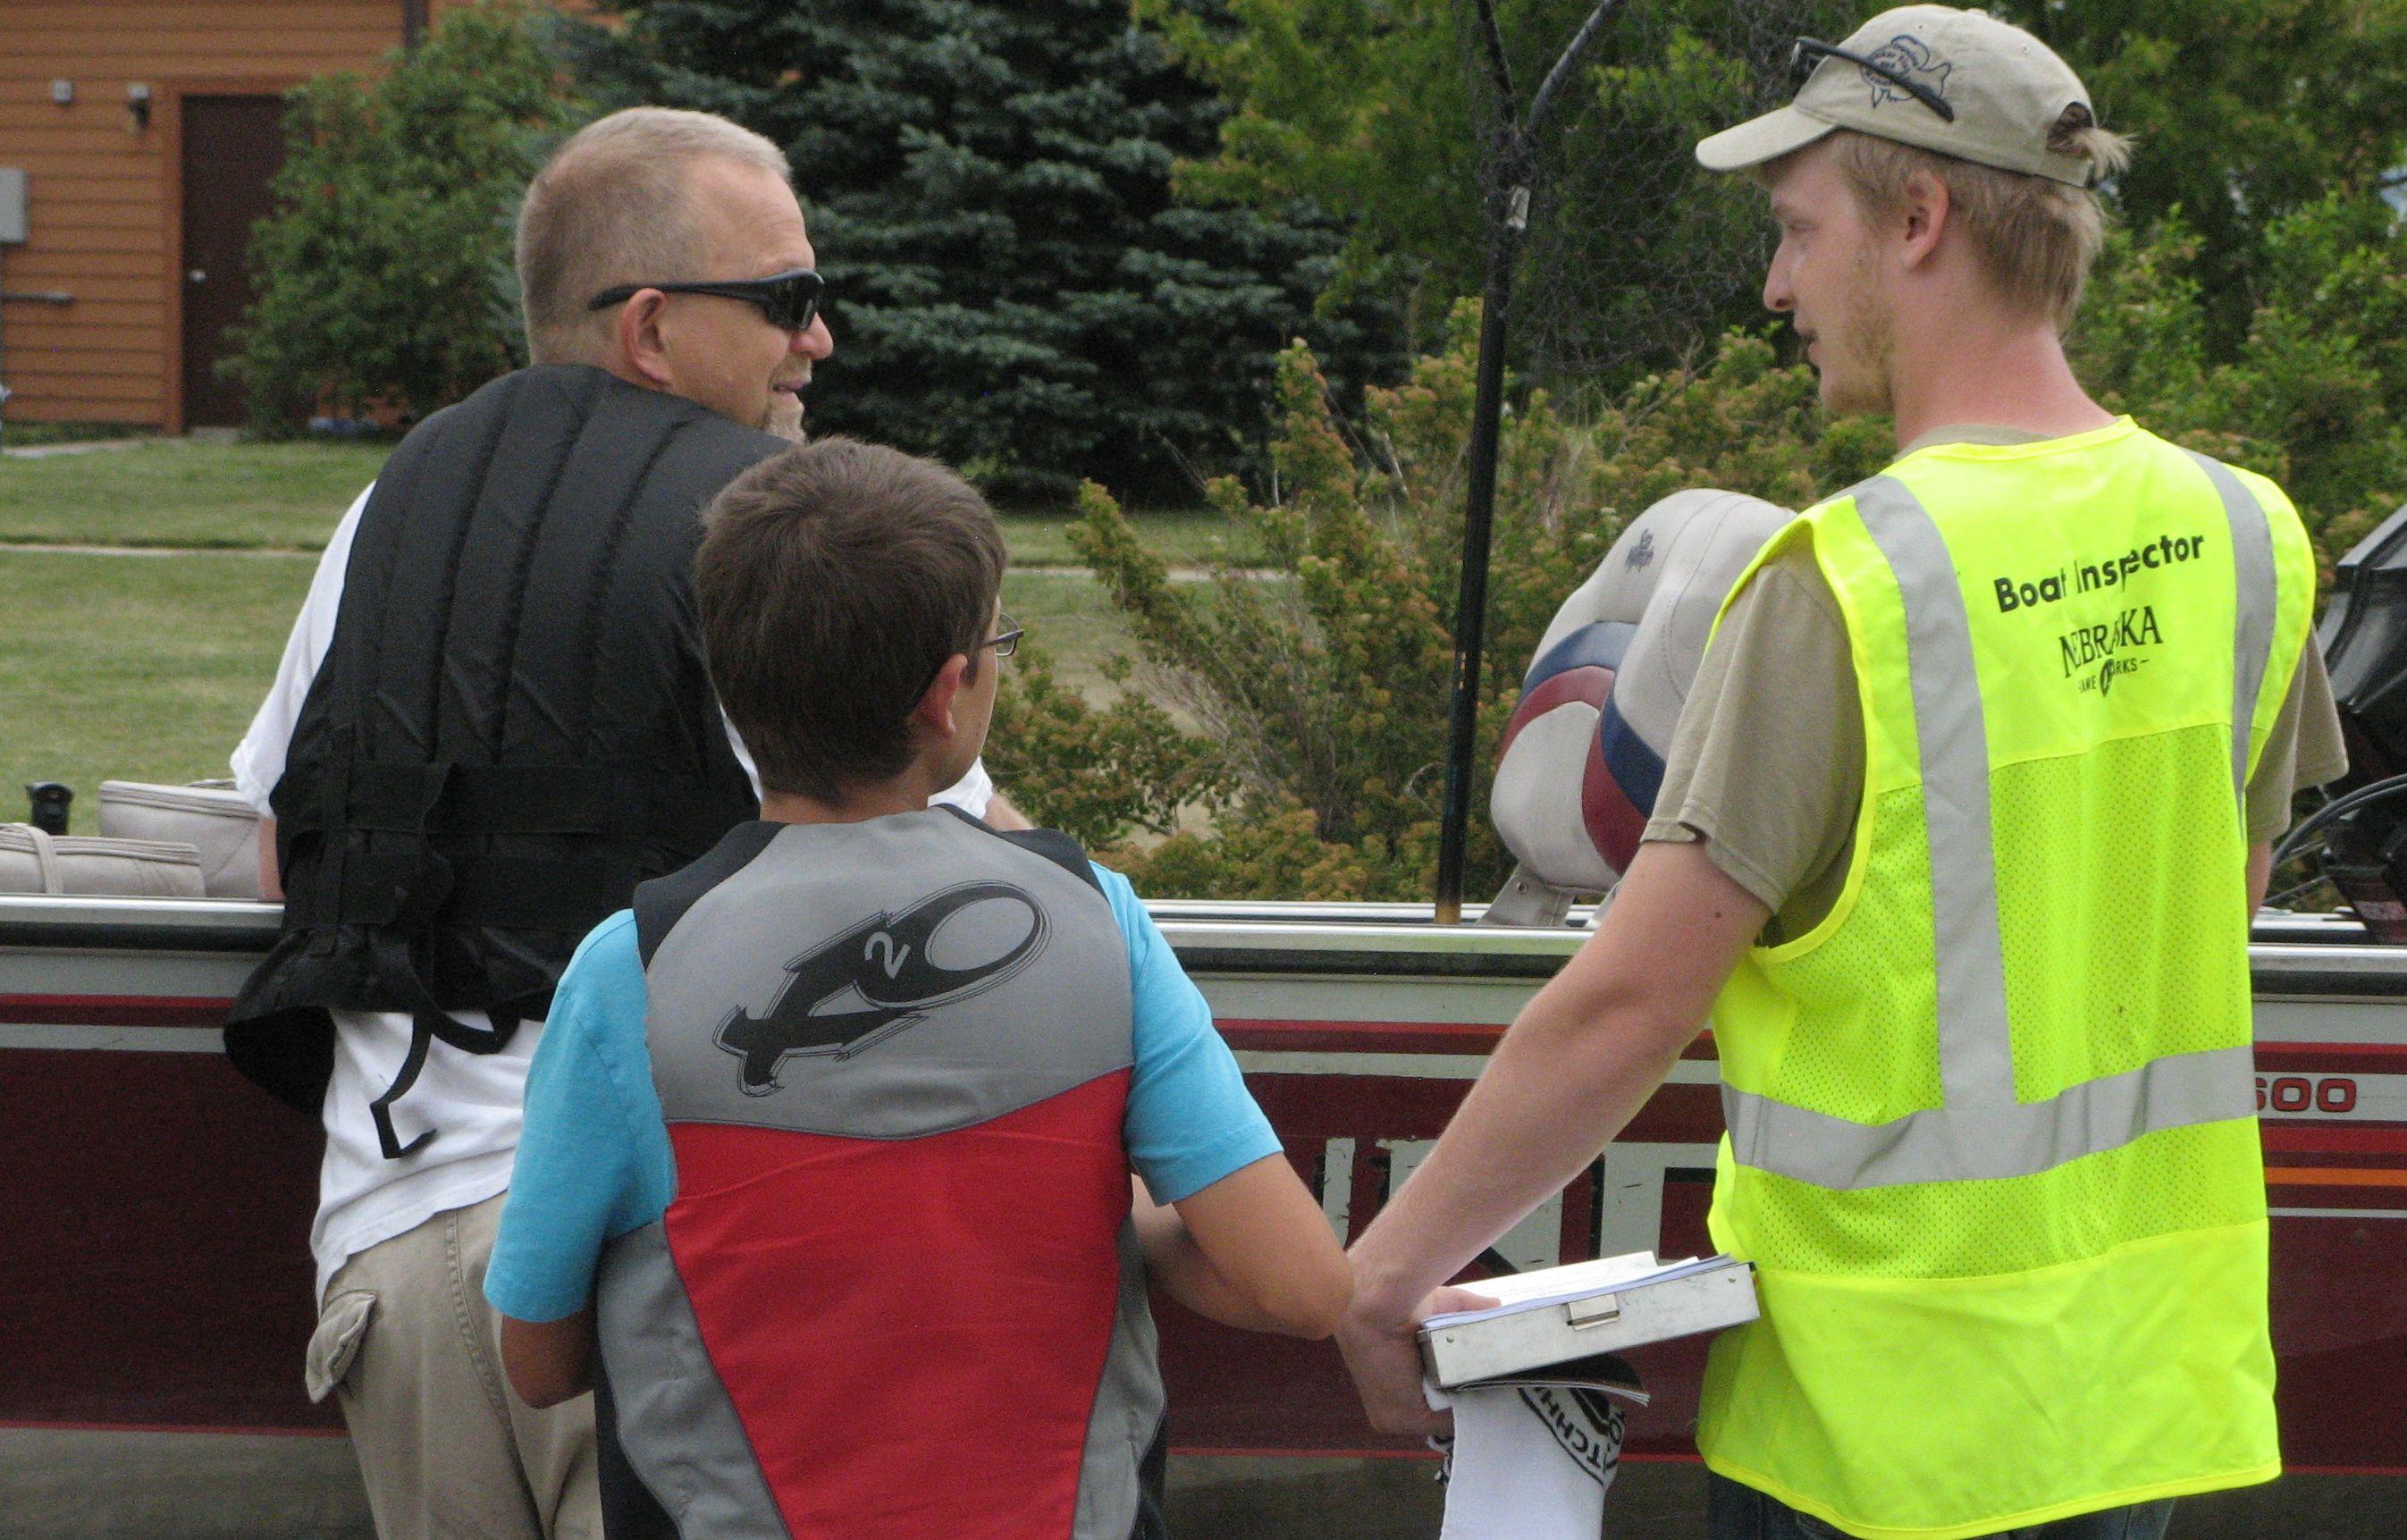 Boat Inspection. Photo: Nebraska Game and Parks Commission